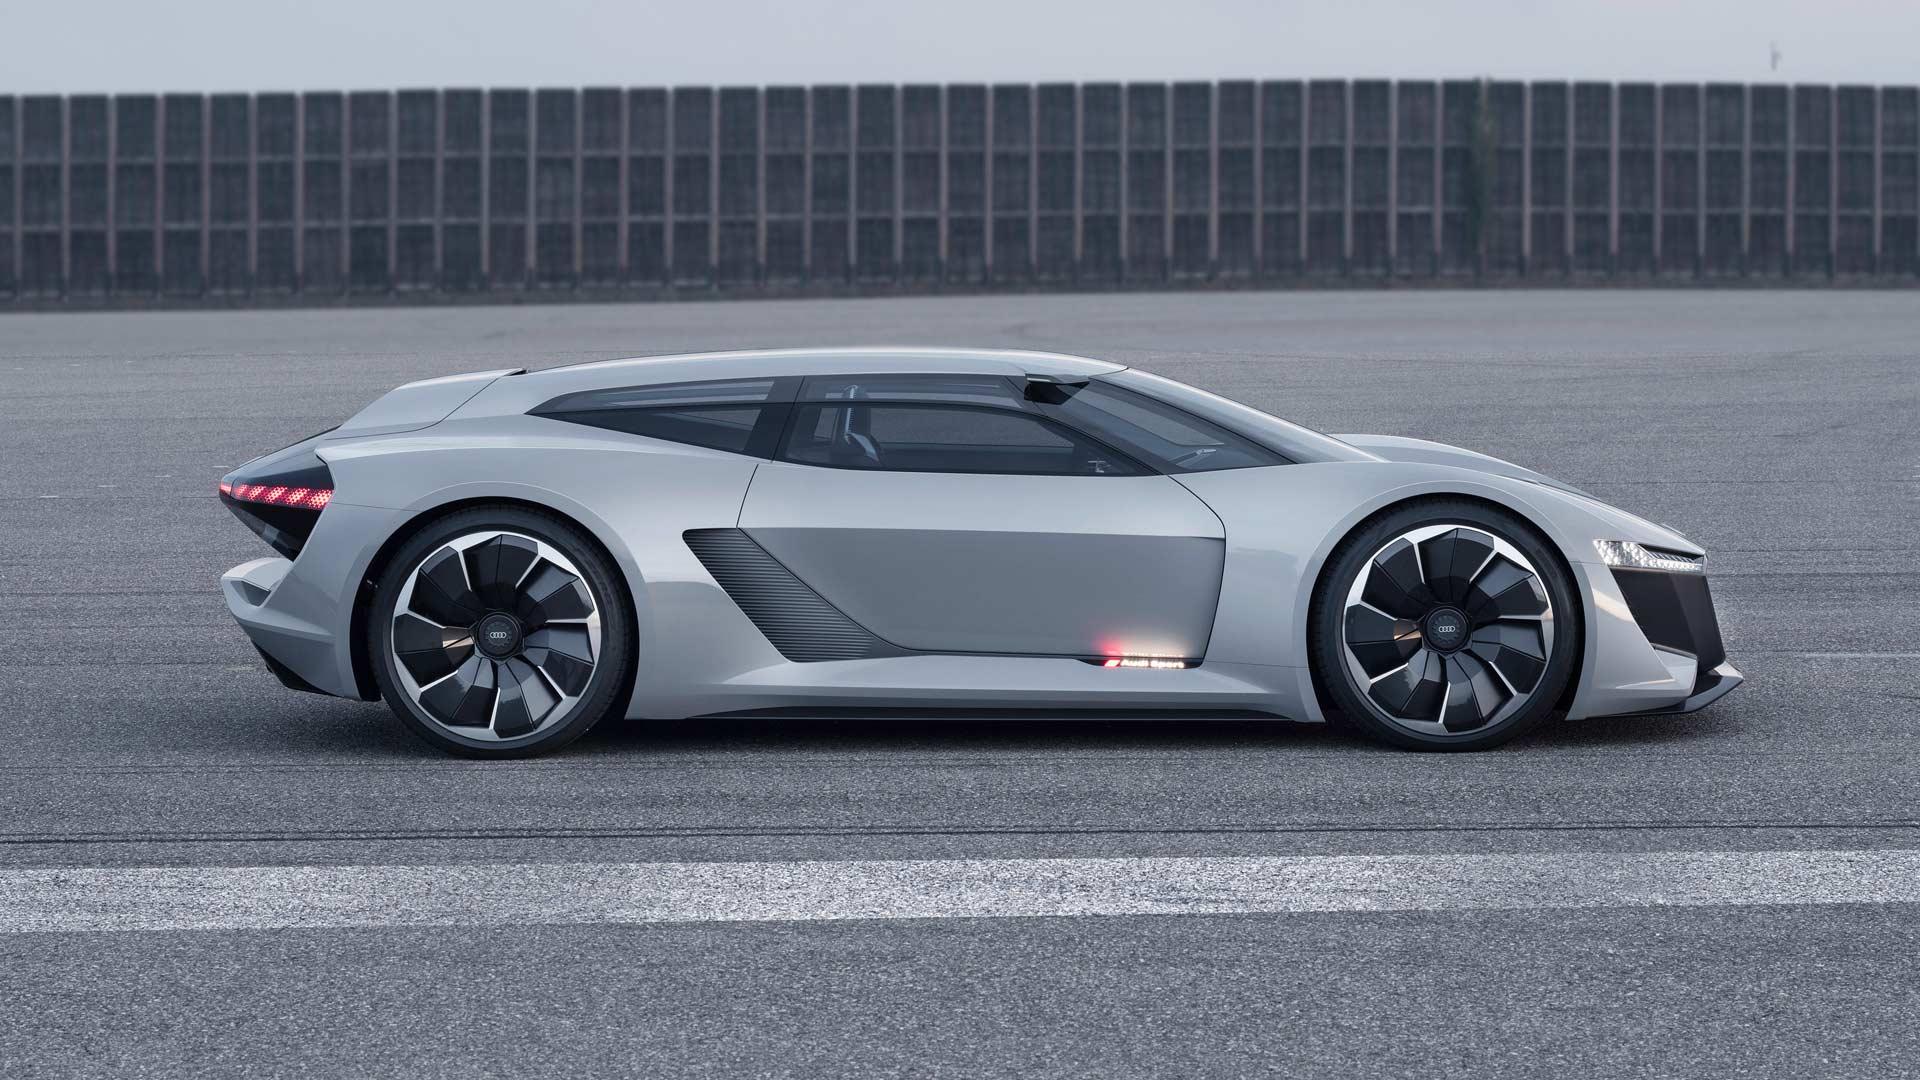 Audi-PB18-e-tron-concept_4